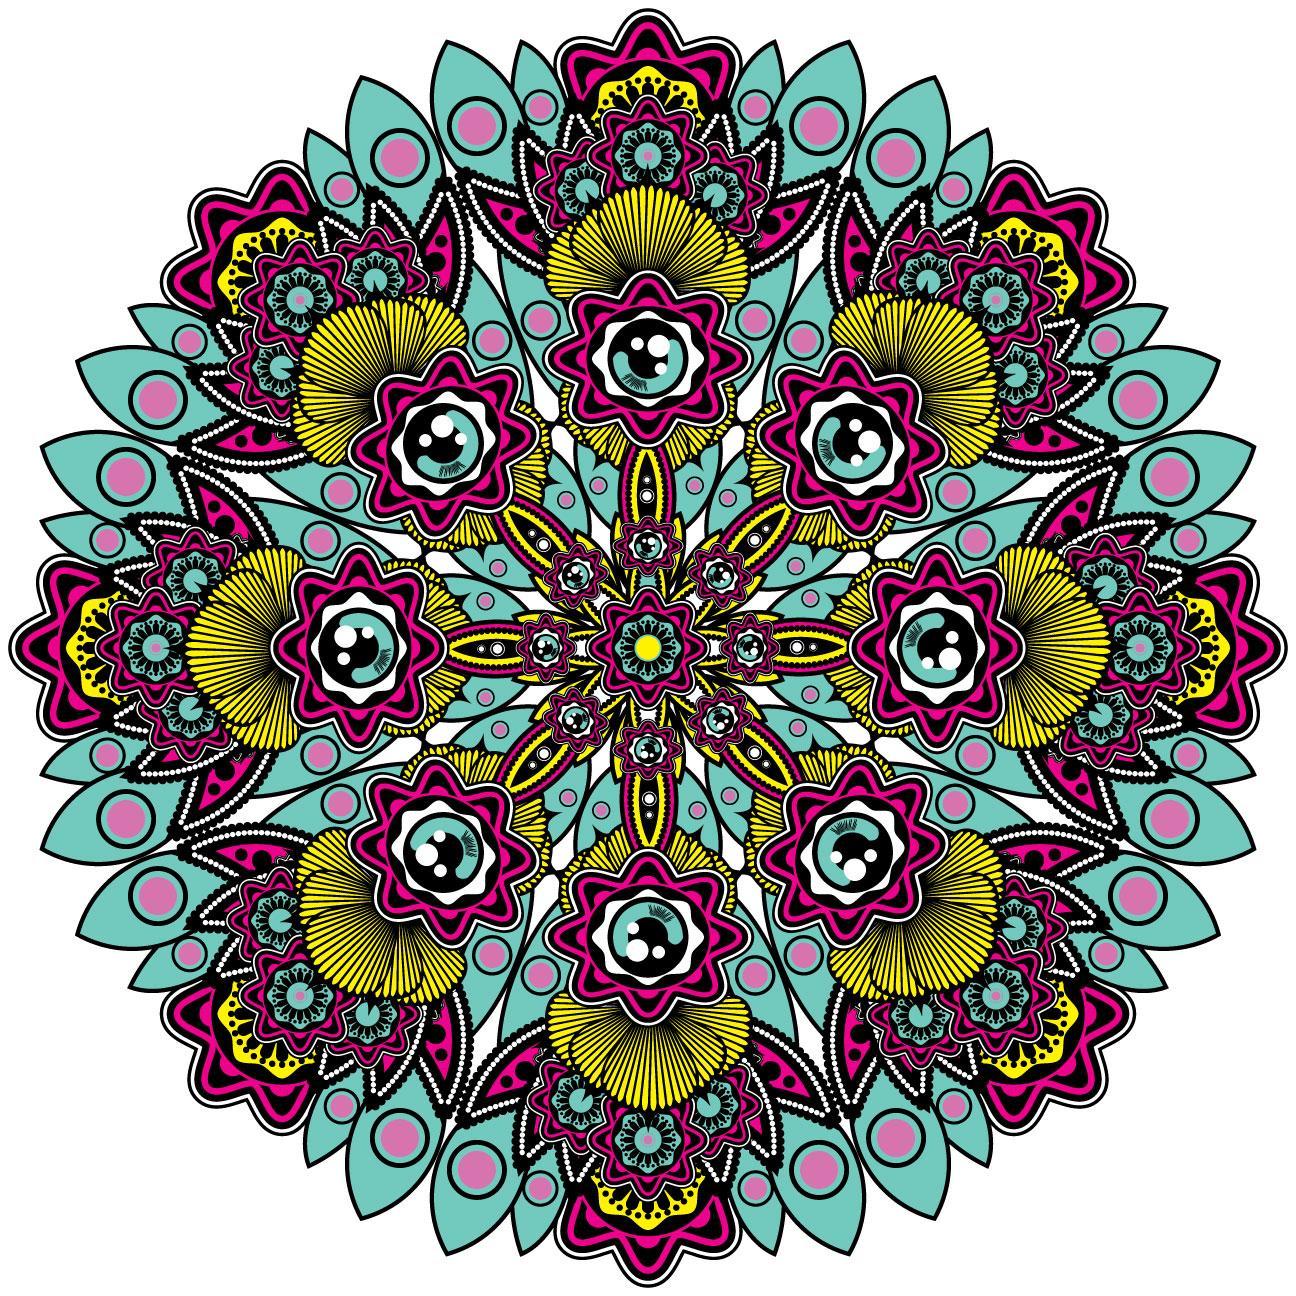 Mandala Line art colour and shading. - image 2 - student project